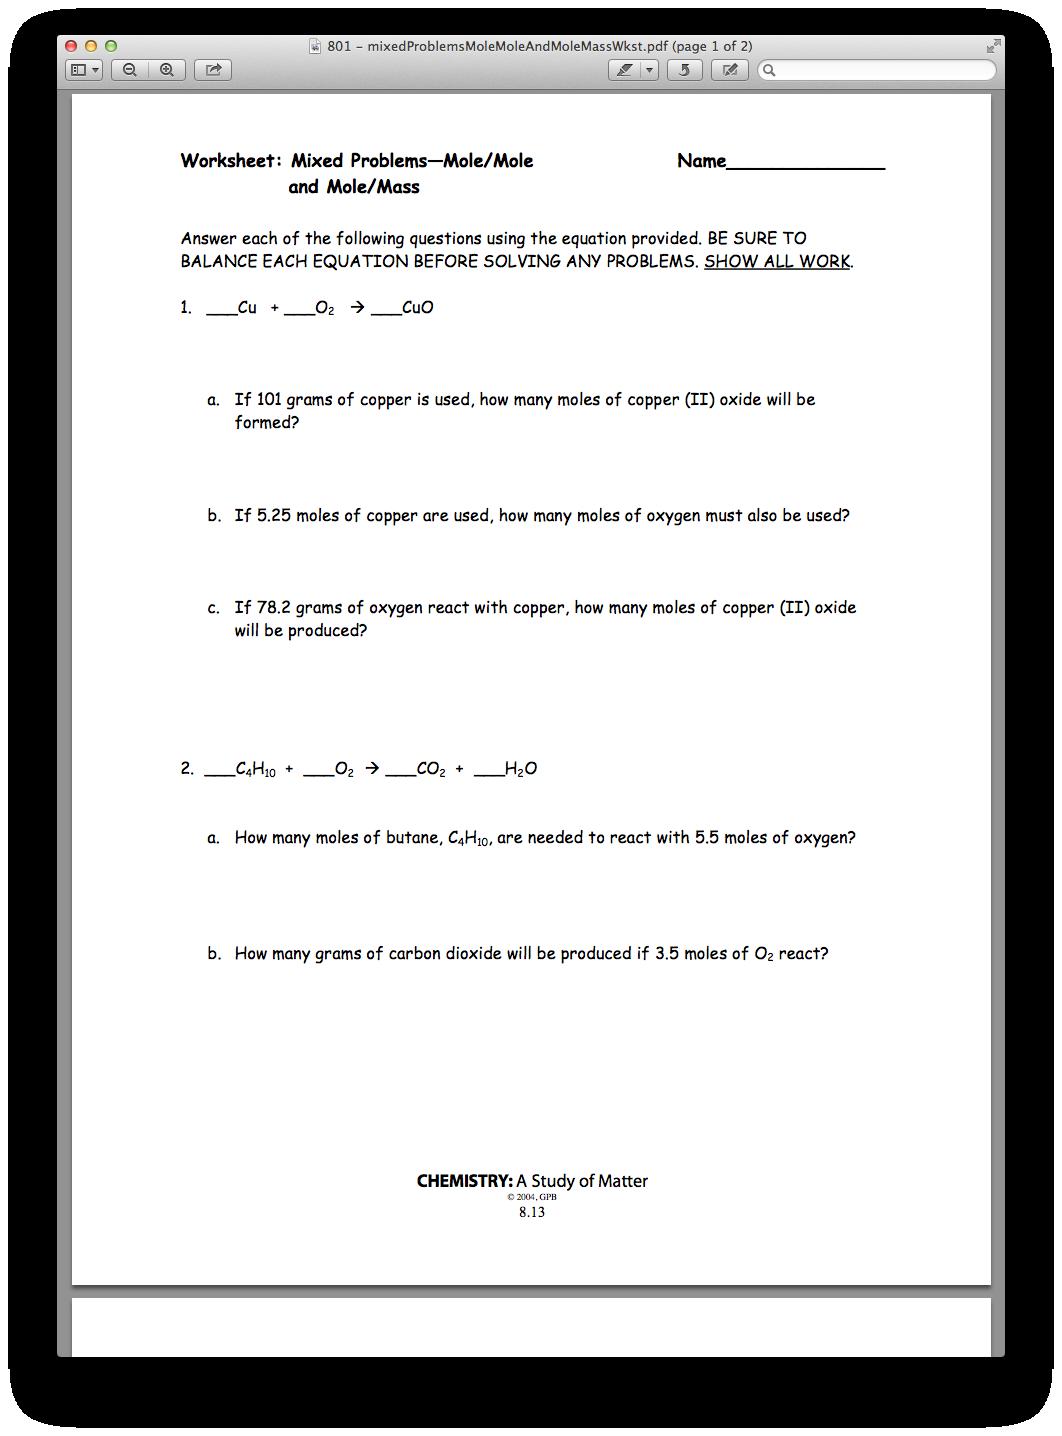 Chemistry Chapter 08, Lesson 01 - Mole/Mole and Mole/Mass